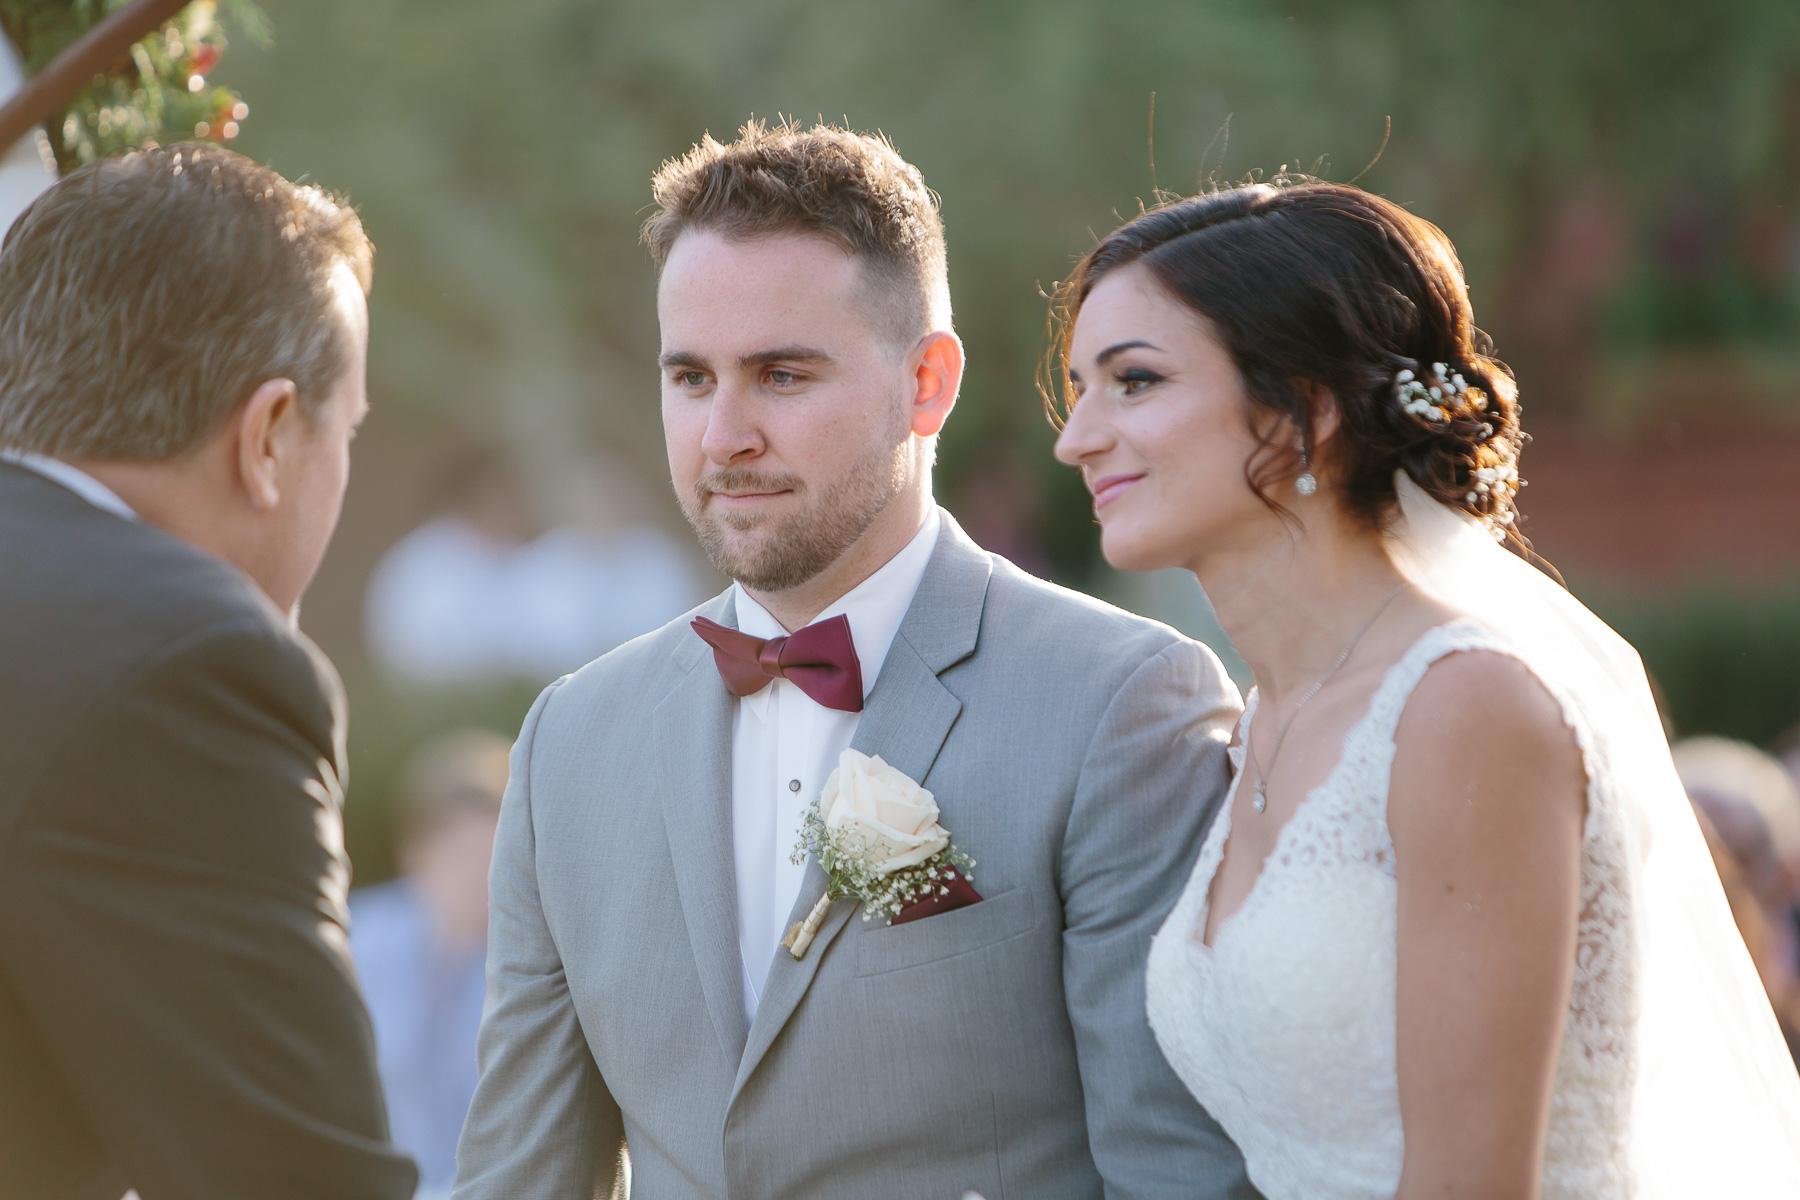 161210-Luxium-Weddings-Arizona-Matt-Jenny-Anthem-Golf-Country-Club-1035.jpg